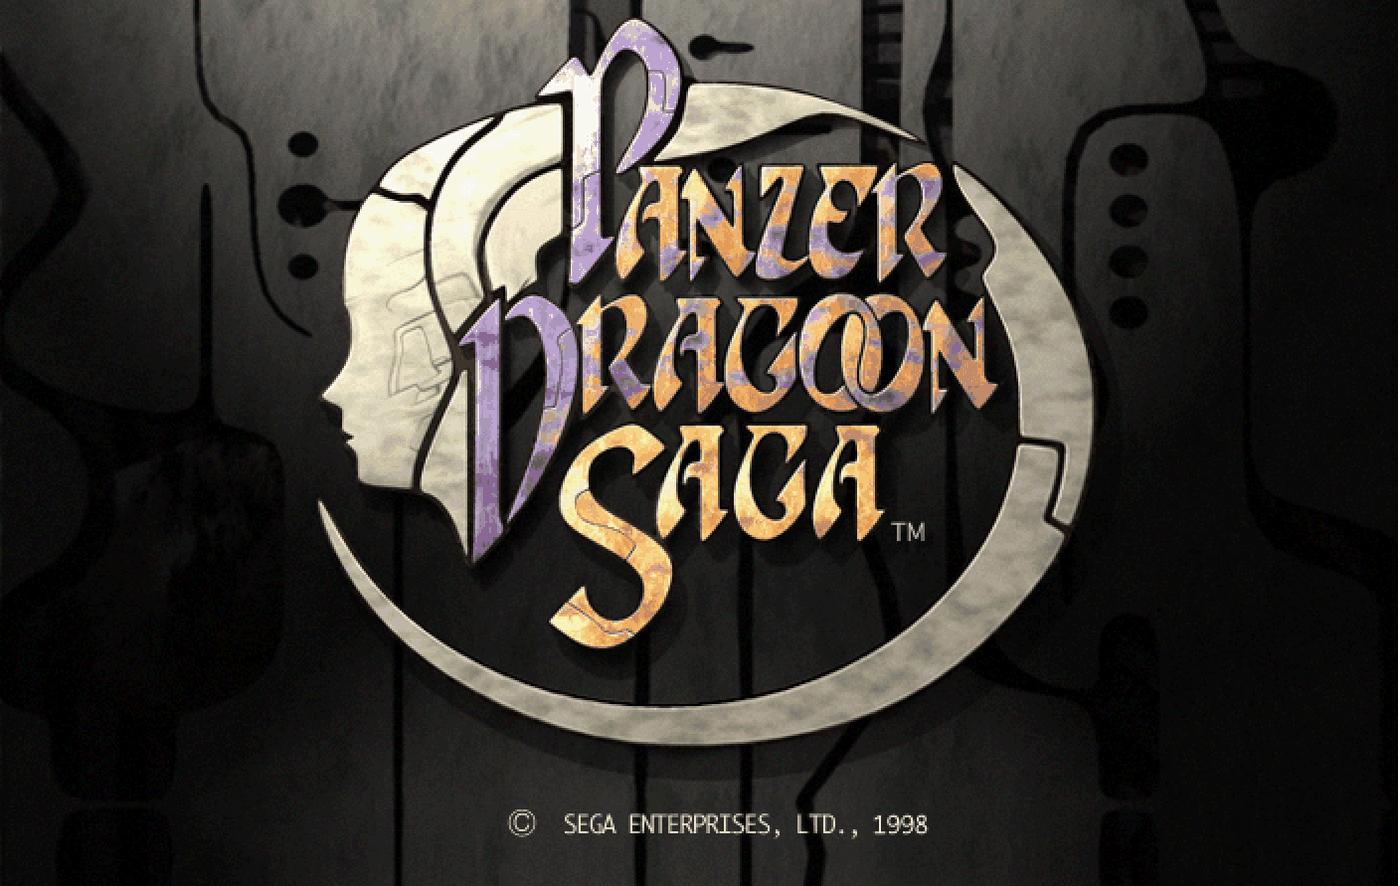 Panzer Dragoon Saga' Remains Gaming's Missing Masterpiece - The Ringer